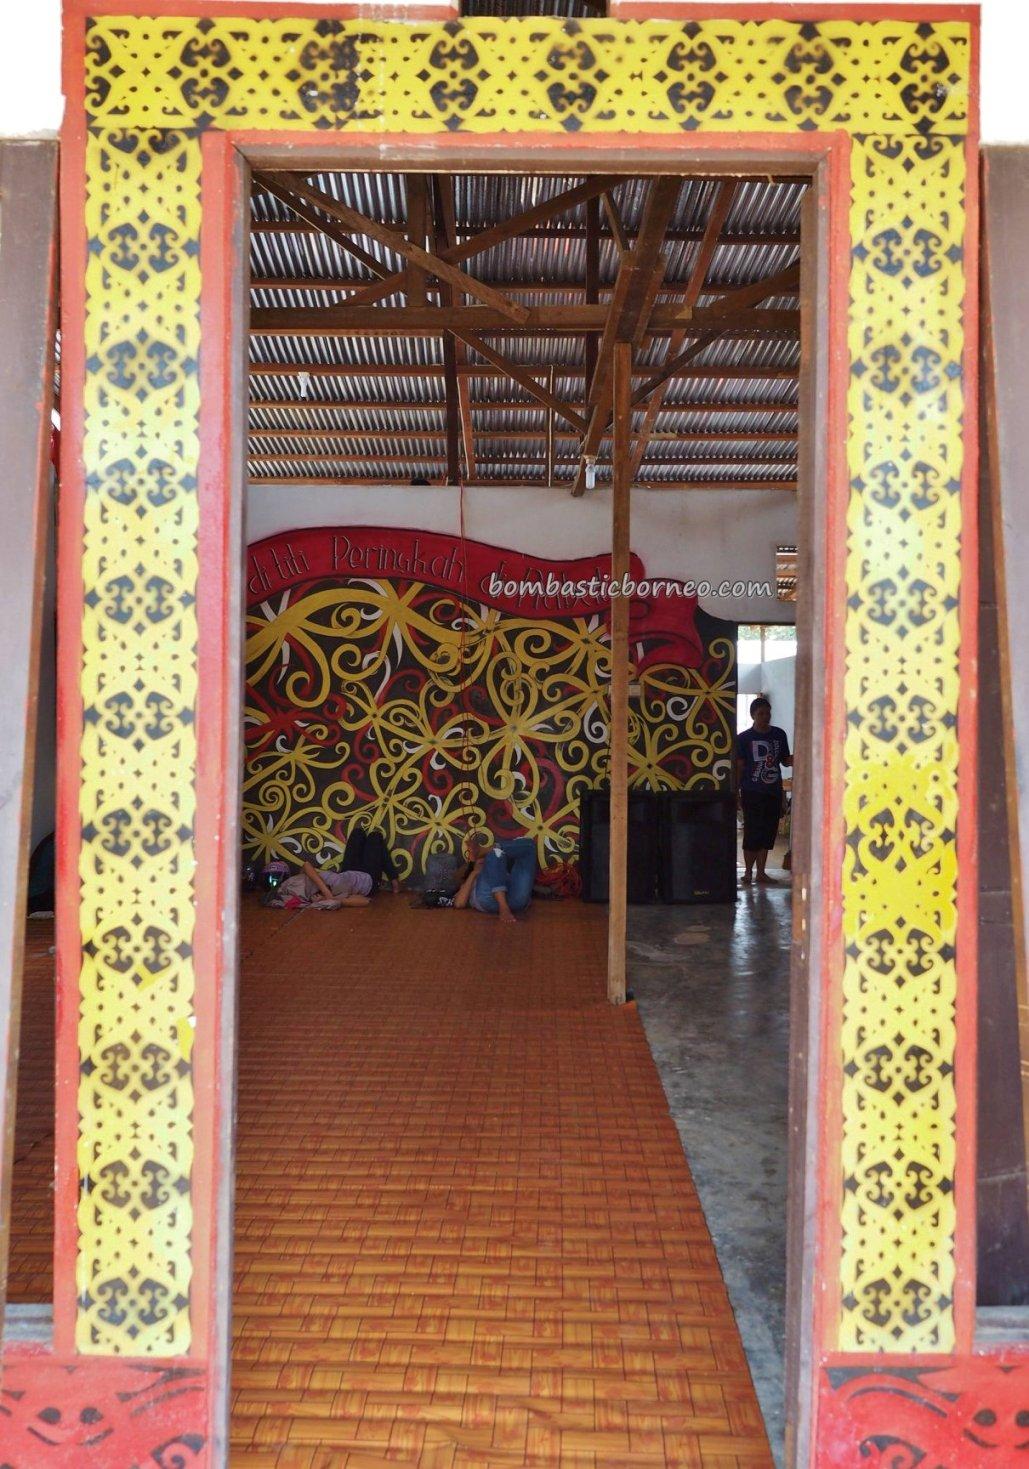 Rumah Betang Raya Dori Mpulor, thanksgiving, authentic, traditional, destination, culture, Kalimantan Barat, ethnic, native, tribe, tribal, Tourism, tourist attraction, trans borneo,